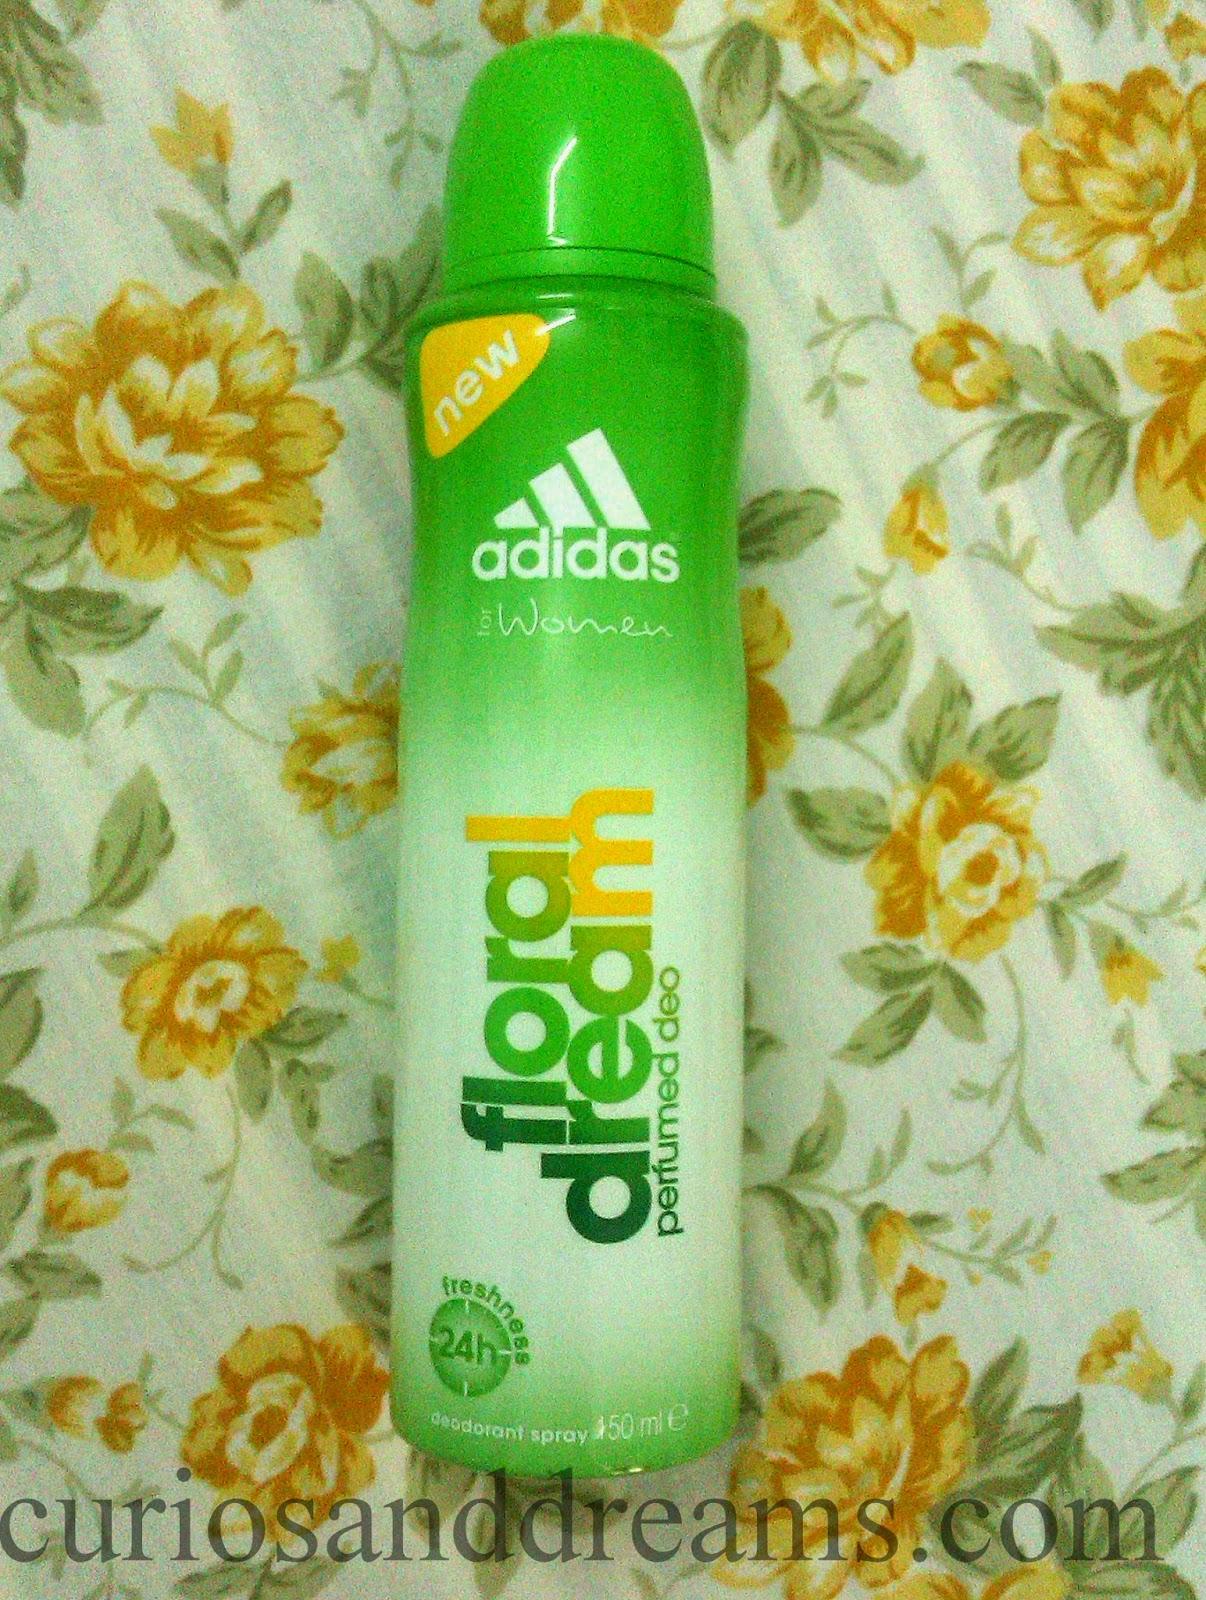 Adidas Floral Dream Deodorant Review